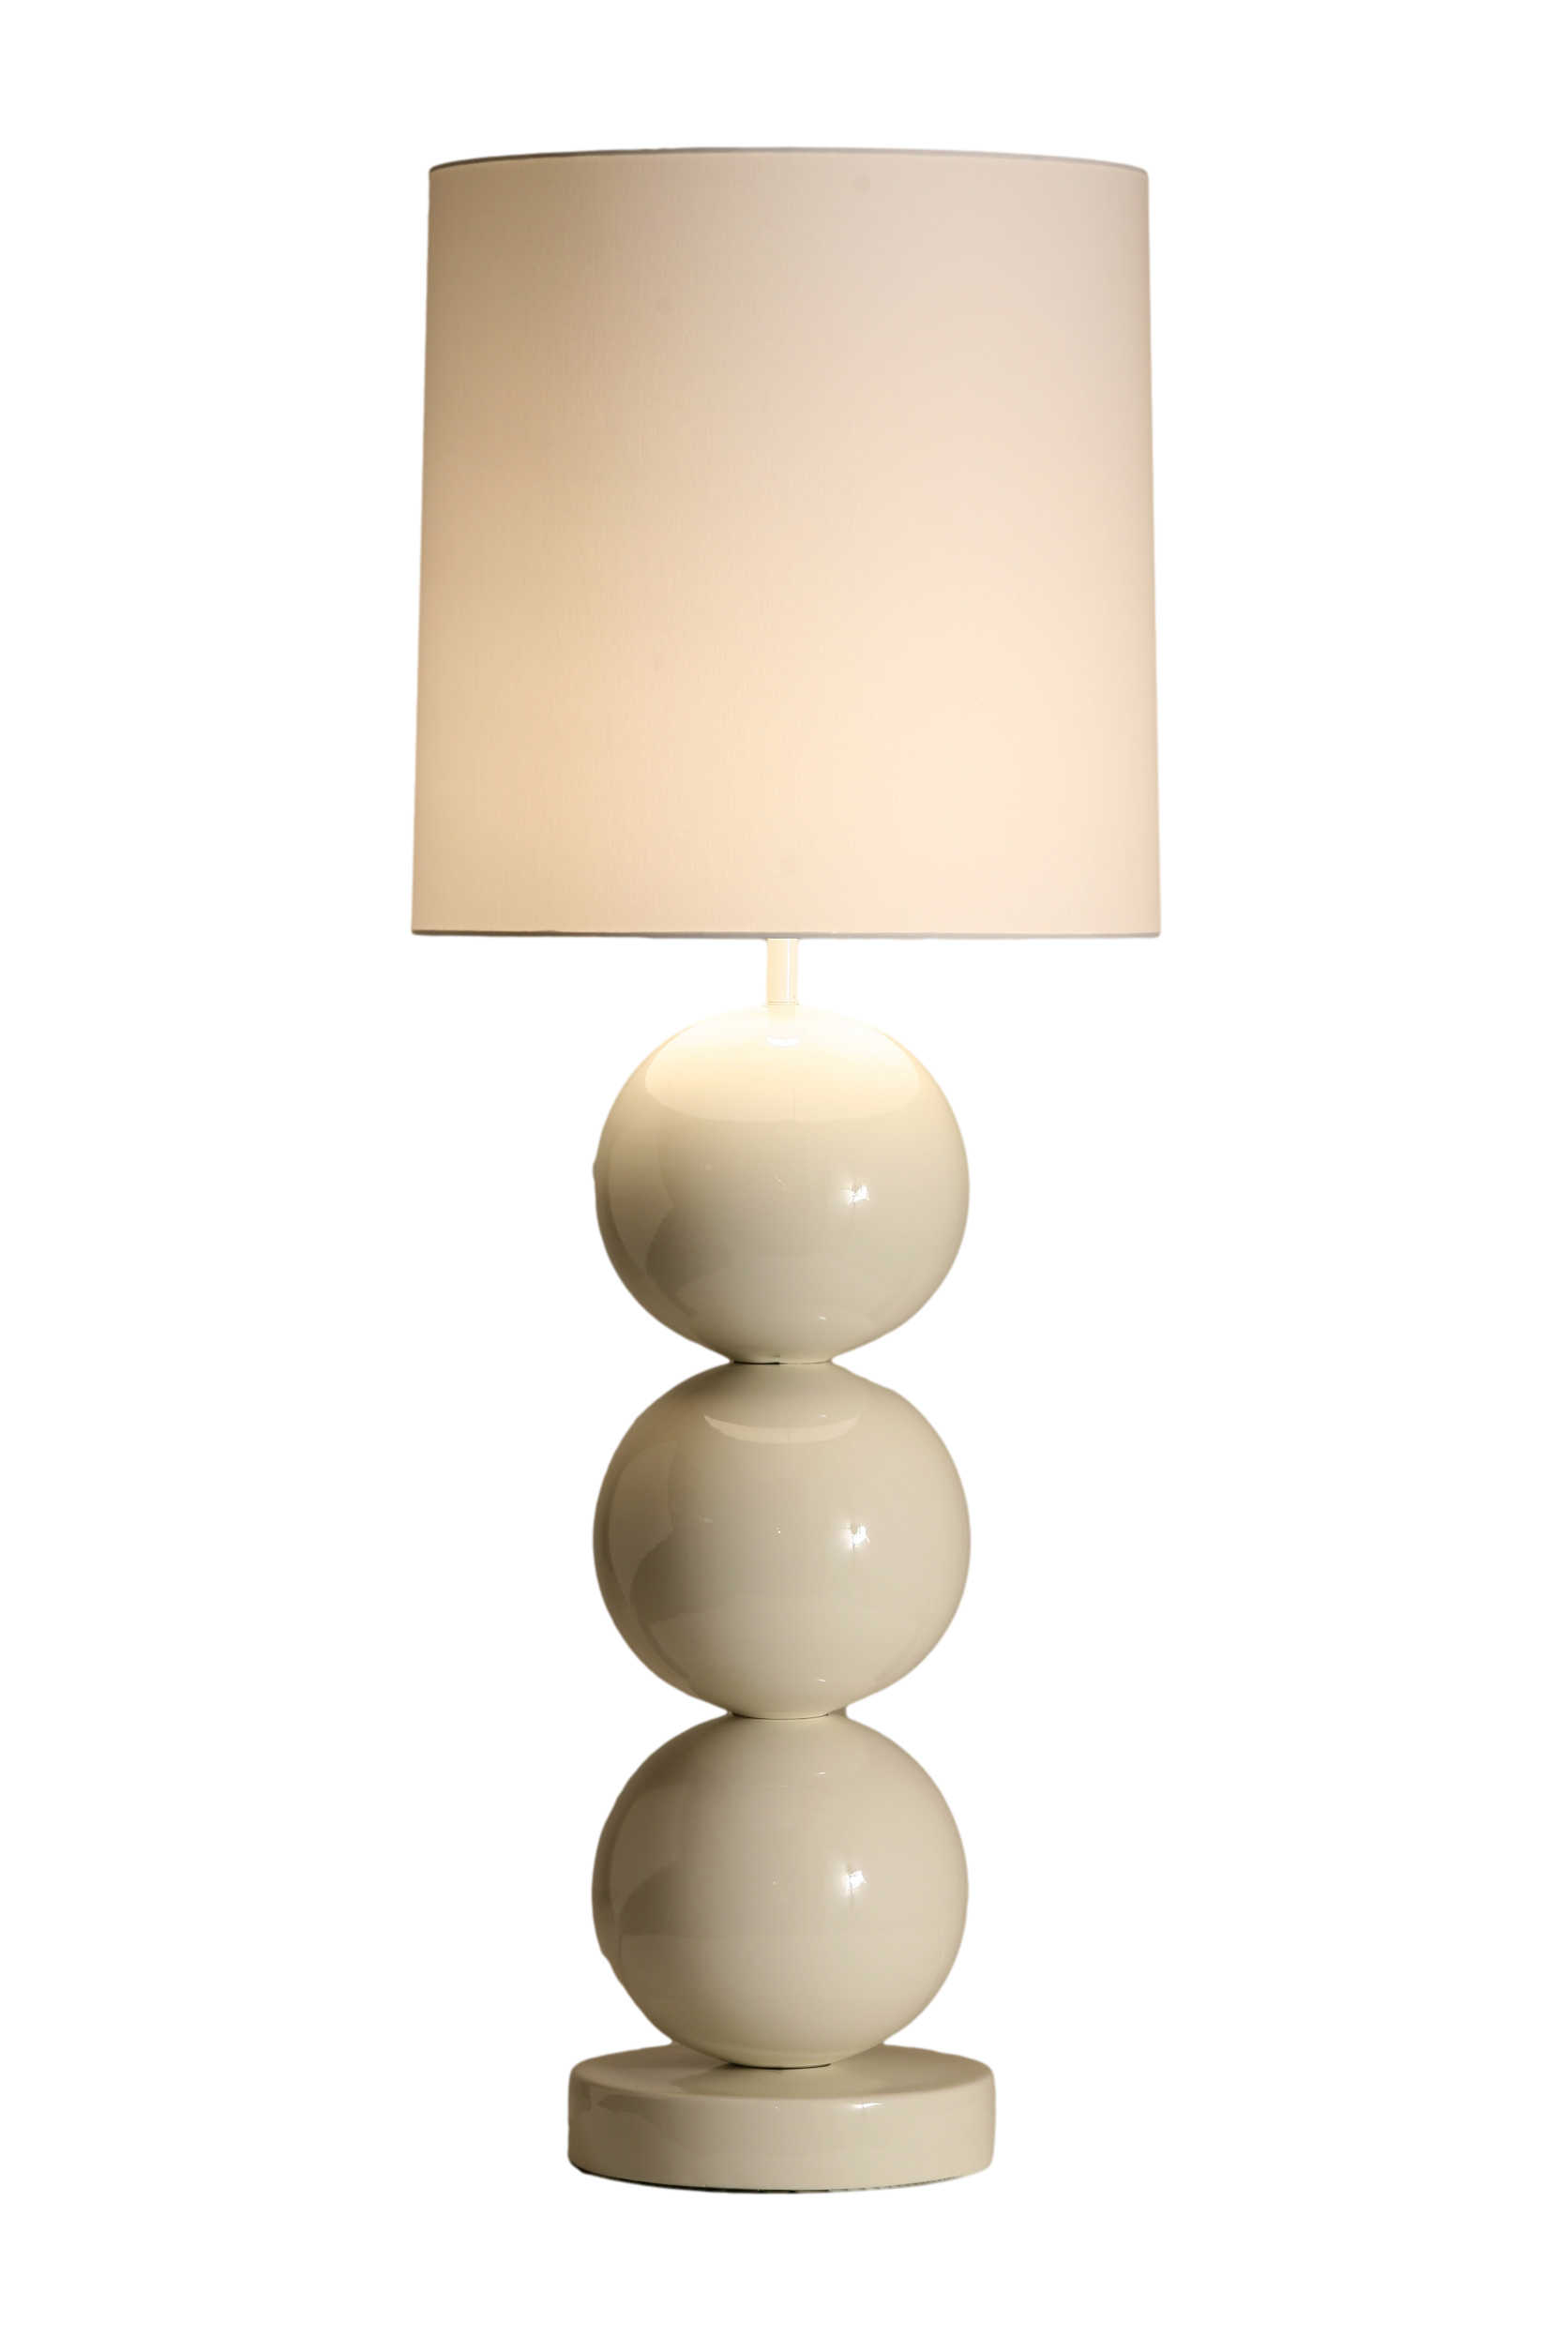 Stout Verlichting Collectie Sfeerfoto Tafel lamp met 3 x grote bol Ø 25